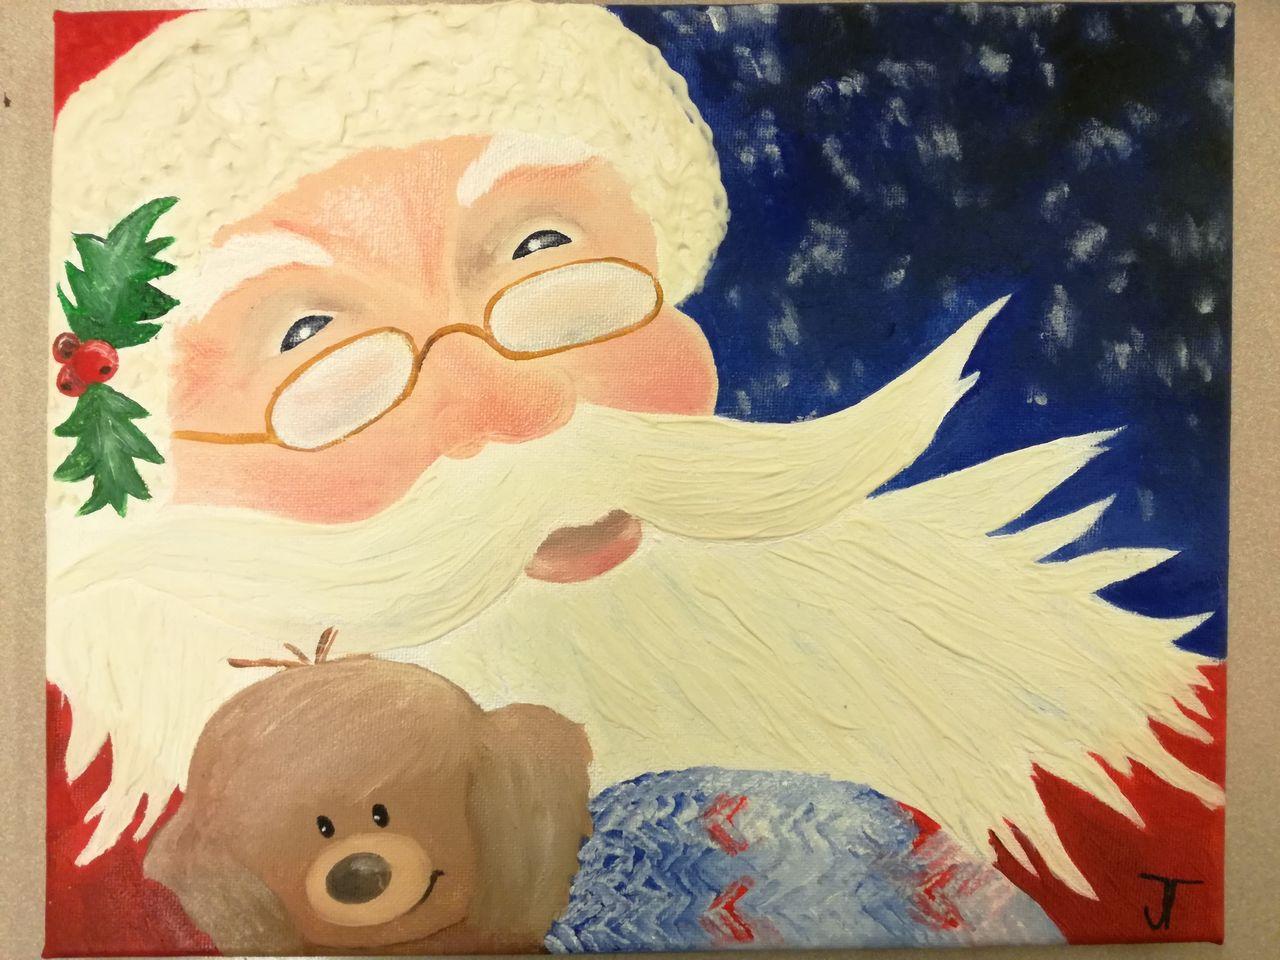 Teddy Weihnachten.Hohoho